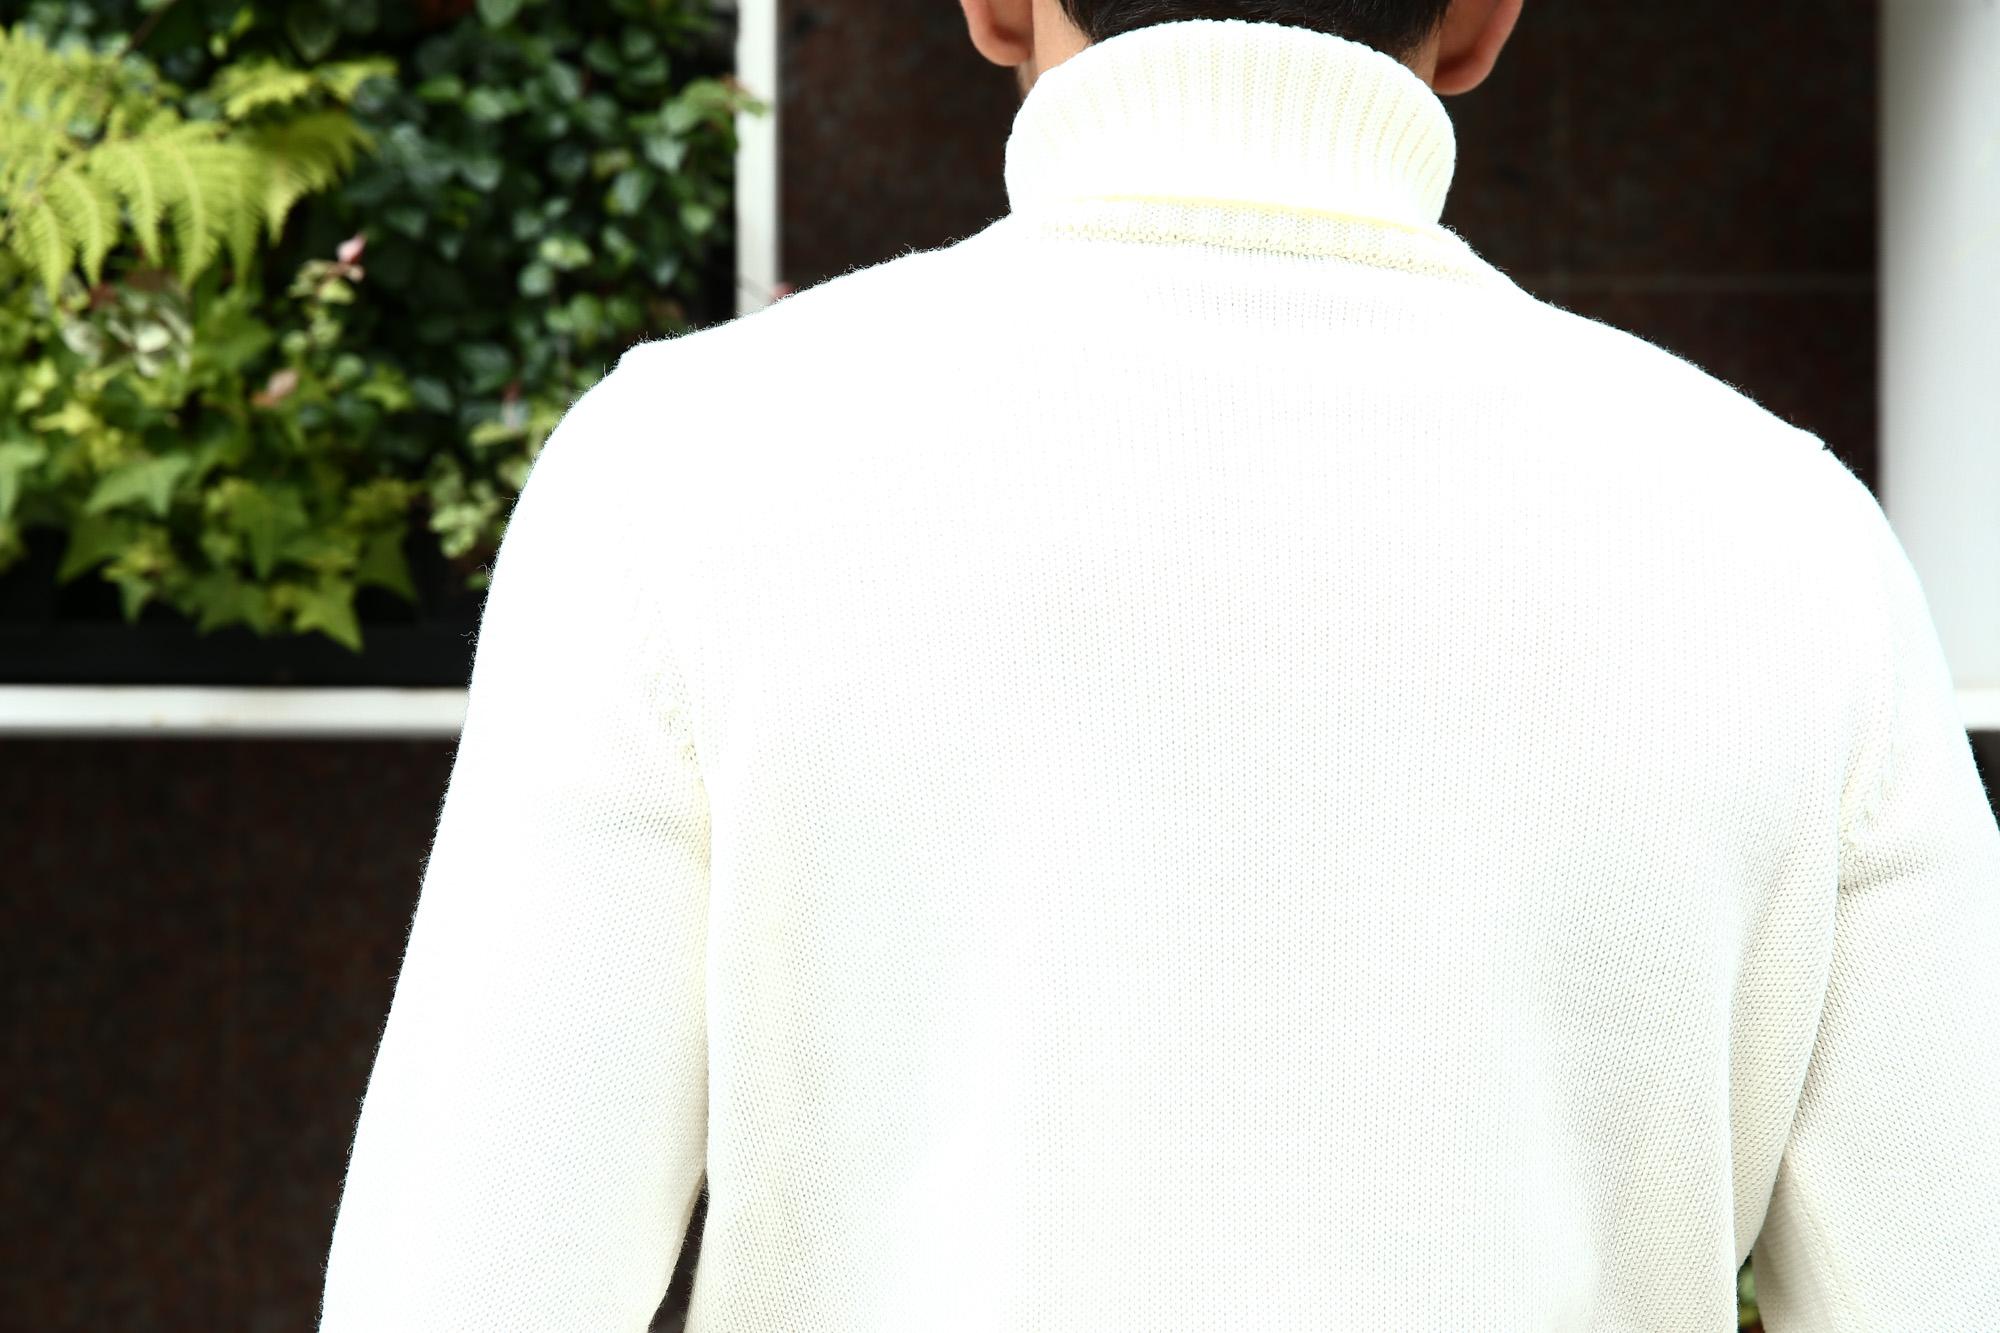 【ZANONE / ザノーネ】 Turtle Neck Sweater タートルネックセーター VIRGIN WOOL 100% ミドルゲージ ウールニット セーター OFF WHITE (オフホワイト・Z3623) made in italy (イタリア製) 2017 秋冬新作 zanone ザノーネ 愛知 名古屋 zodiac ゾディアック タートルネック